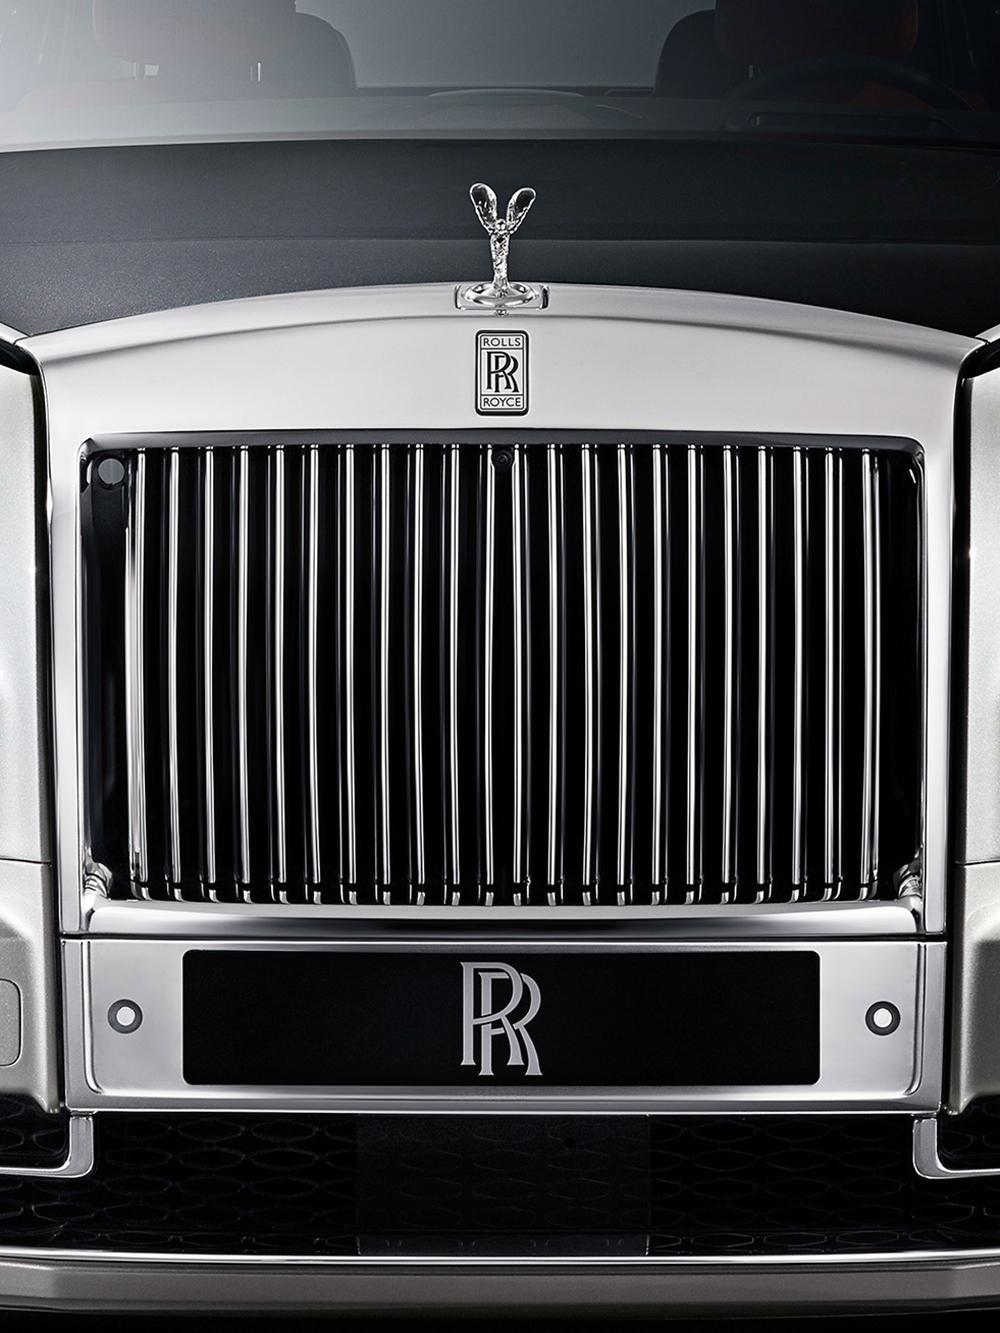 Rolls-Royce的設計師將此神殿的「神」與「形」融入水箱護罩的設計當中,應用黃金比例於設計上,通過22道精心打磨雕琢的格柵,創造出協調壯麗的視覺感受。